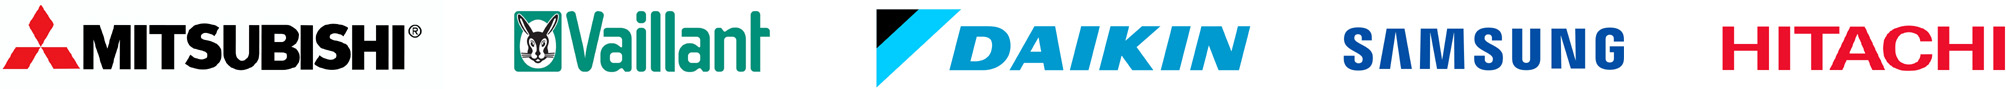 Mitsubishi, Vaillant, Daikin, Samsung and Hitachi Logos